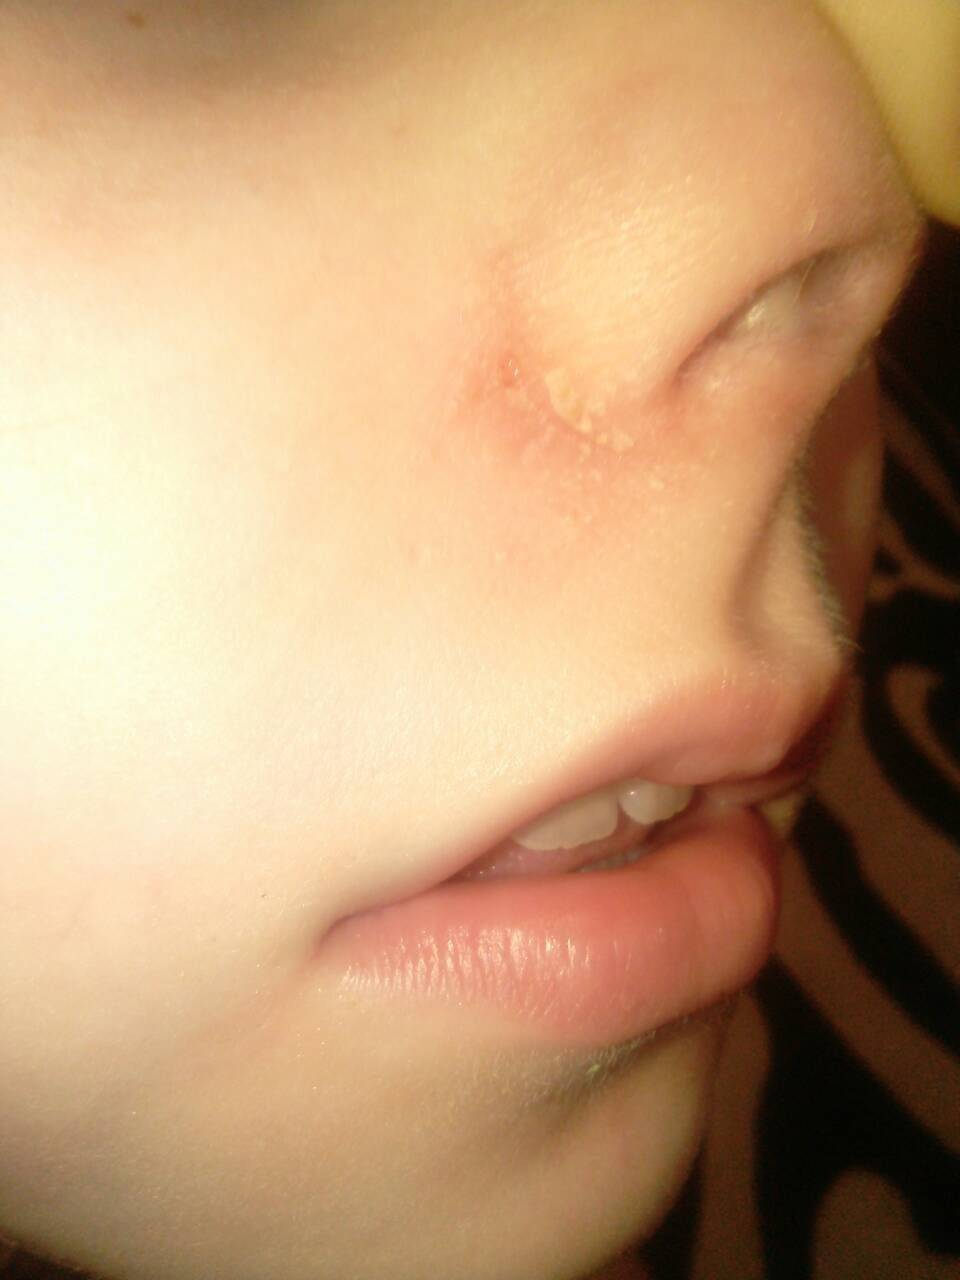 Герпес в носу: лечение и профилактика заболевания